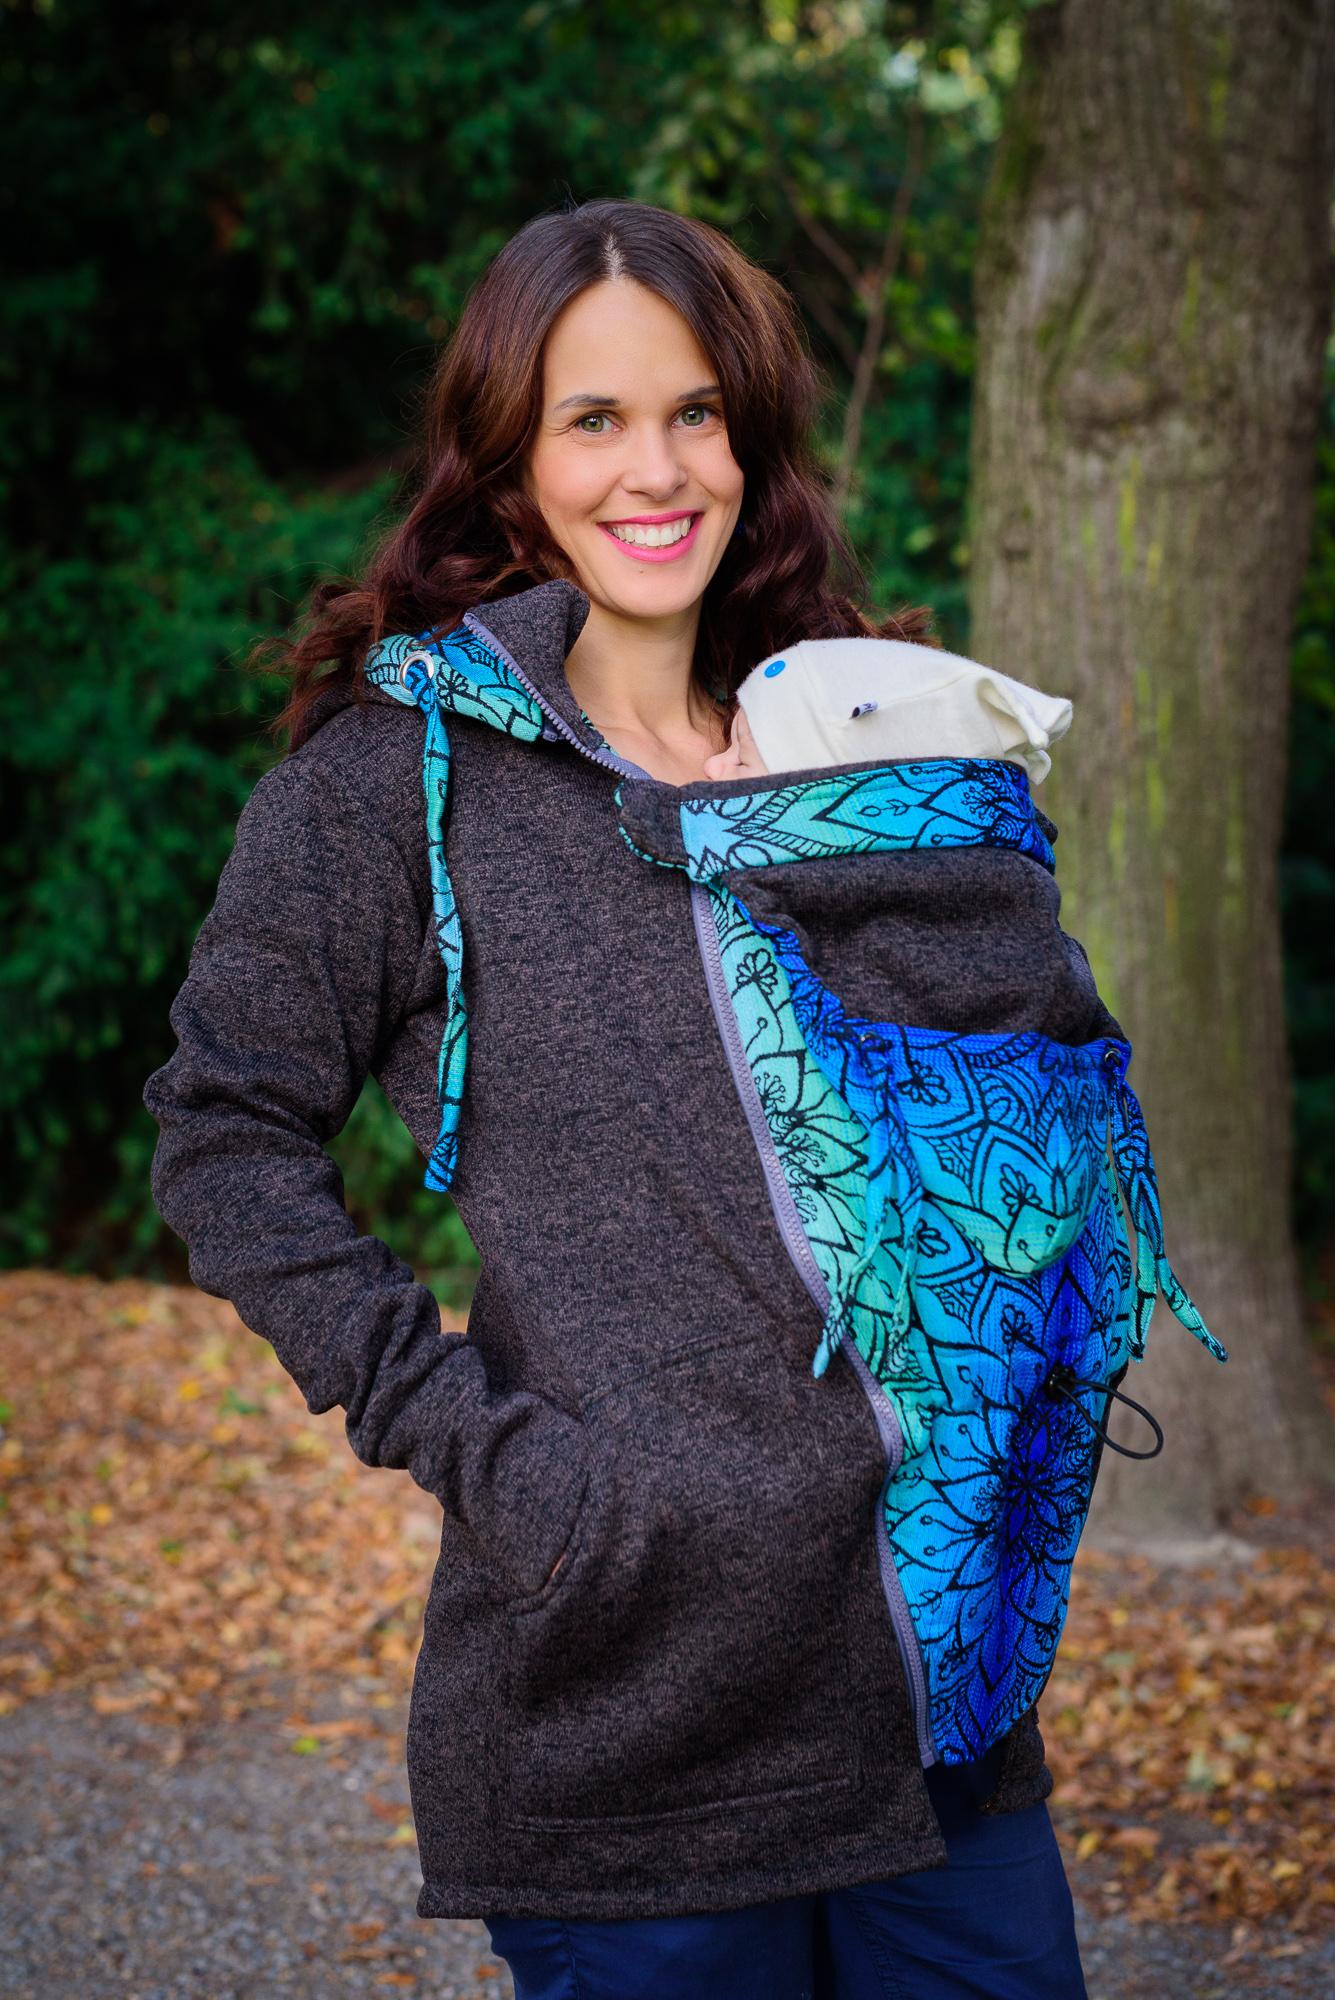 Baby Wearing Black Sweater - Be Lenka Mandala - Polar carrying sweatshirt with 2 in 1 scarf insert l